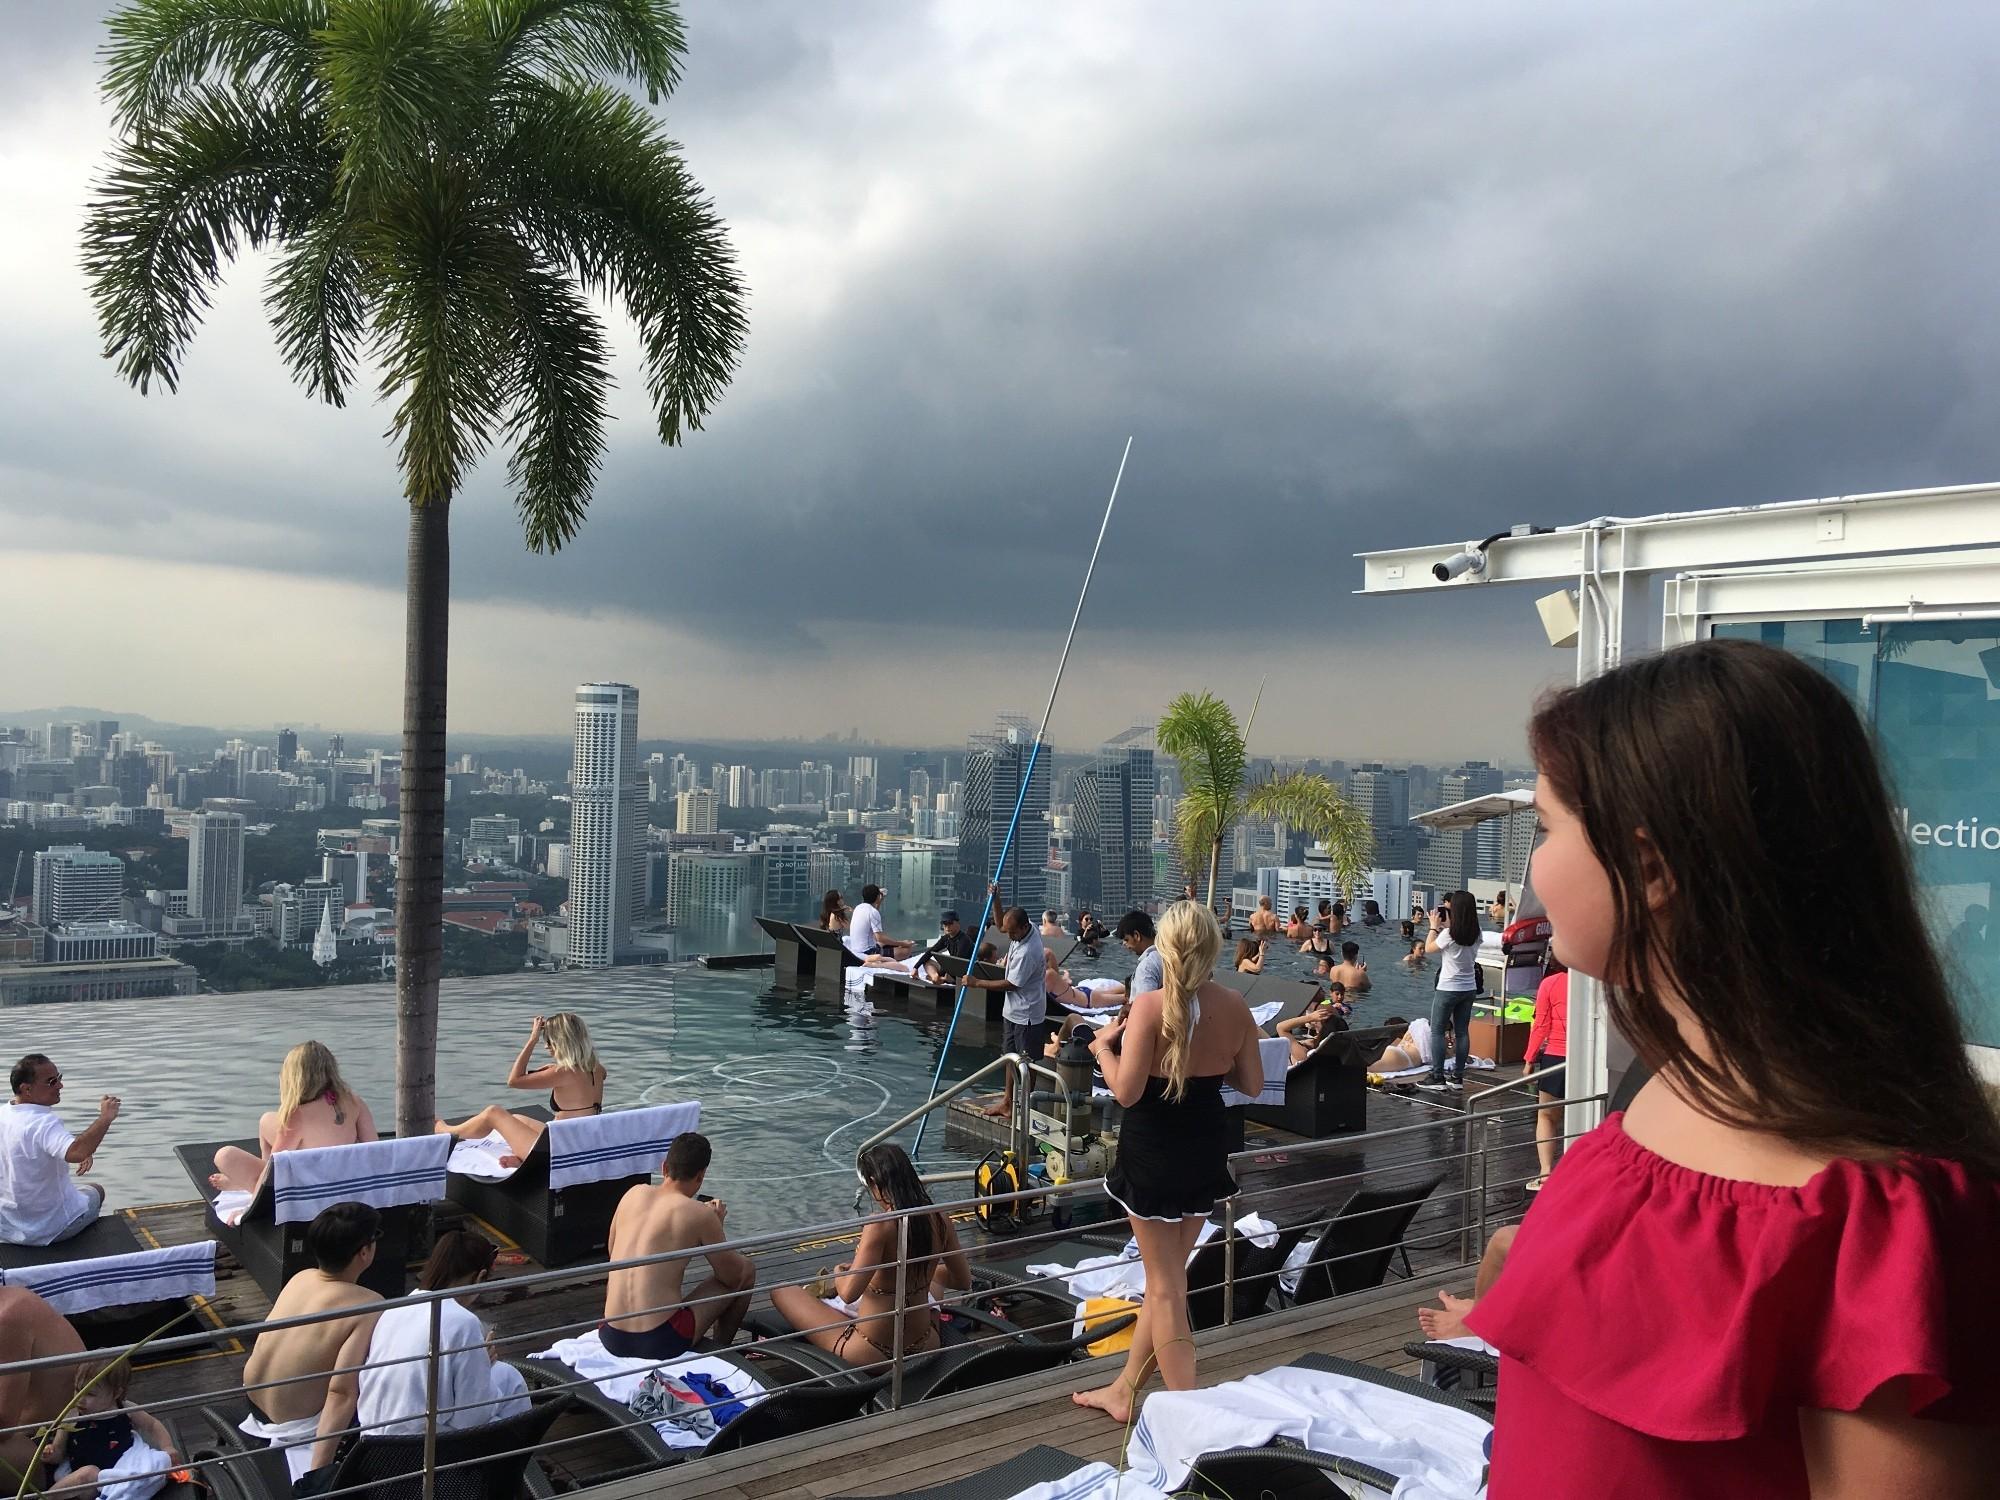 туризм все о сингапуре фото нас будет